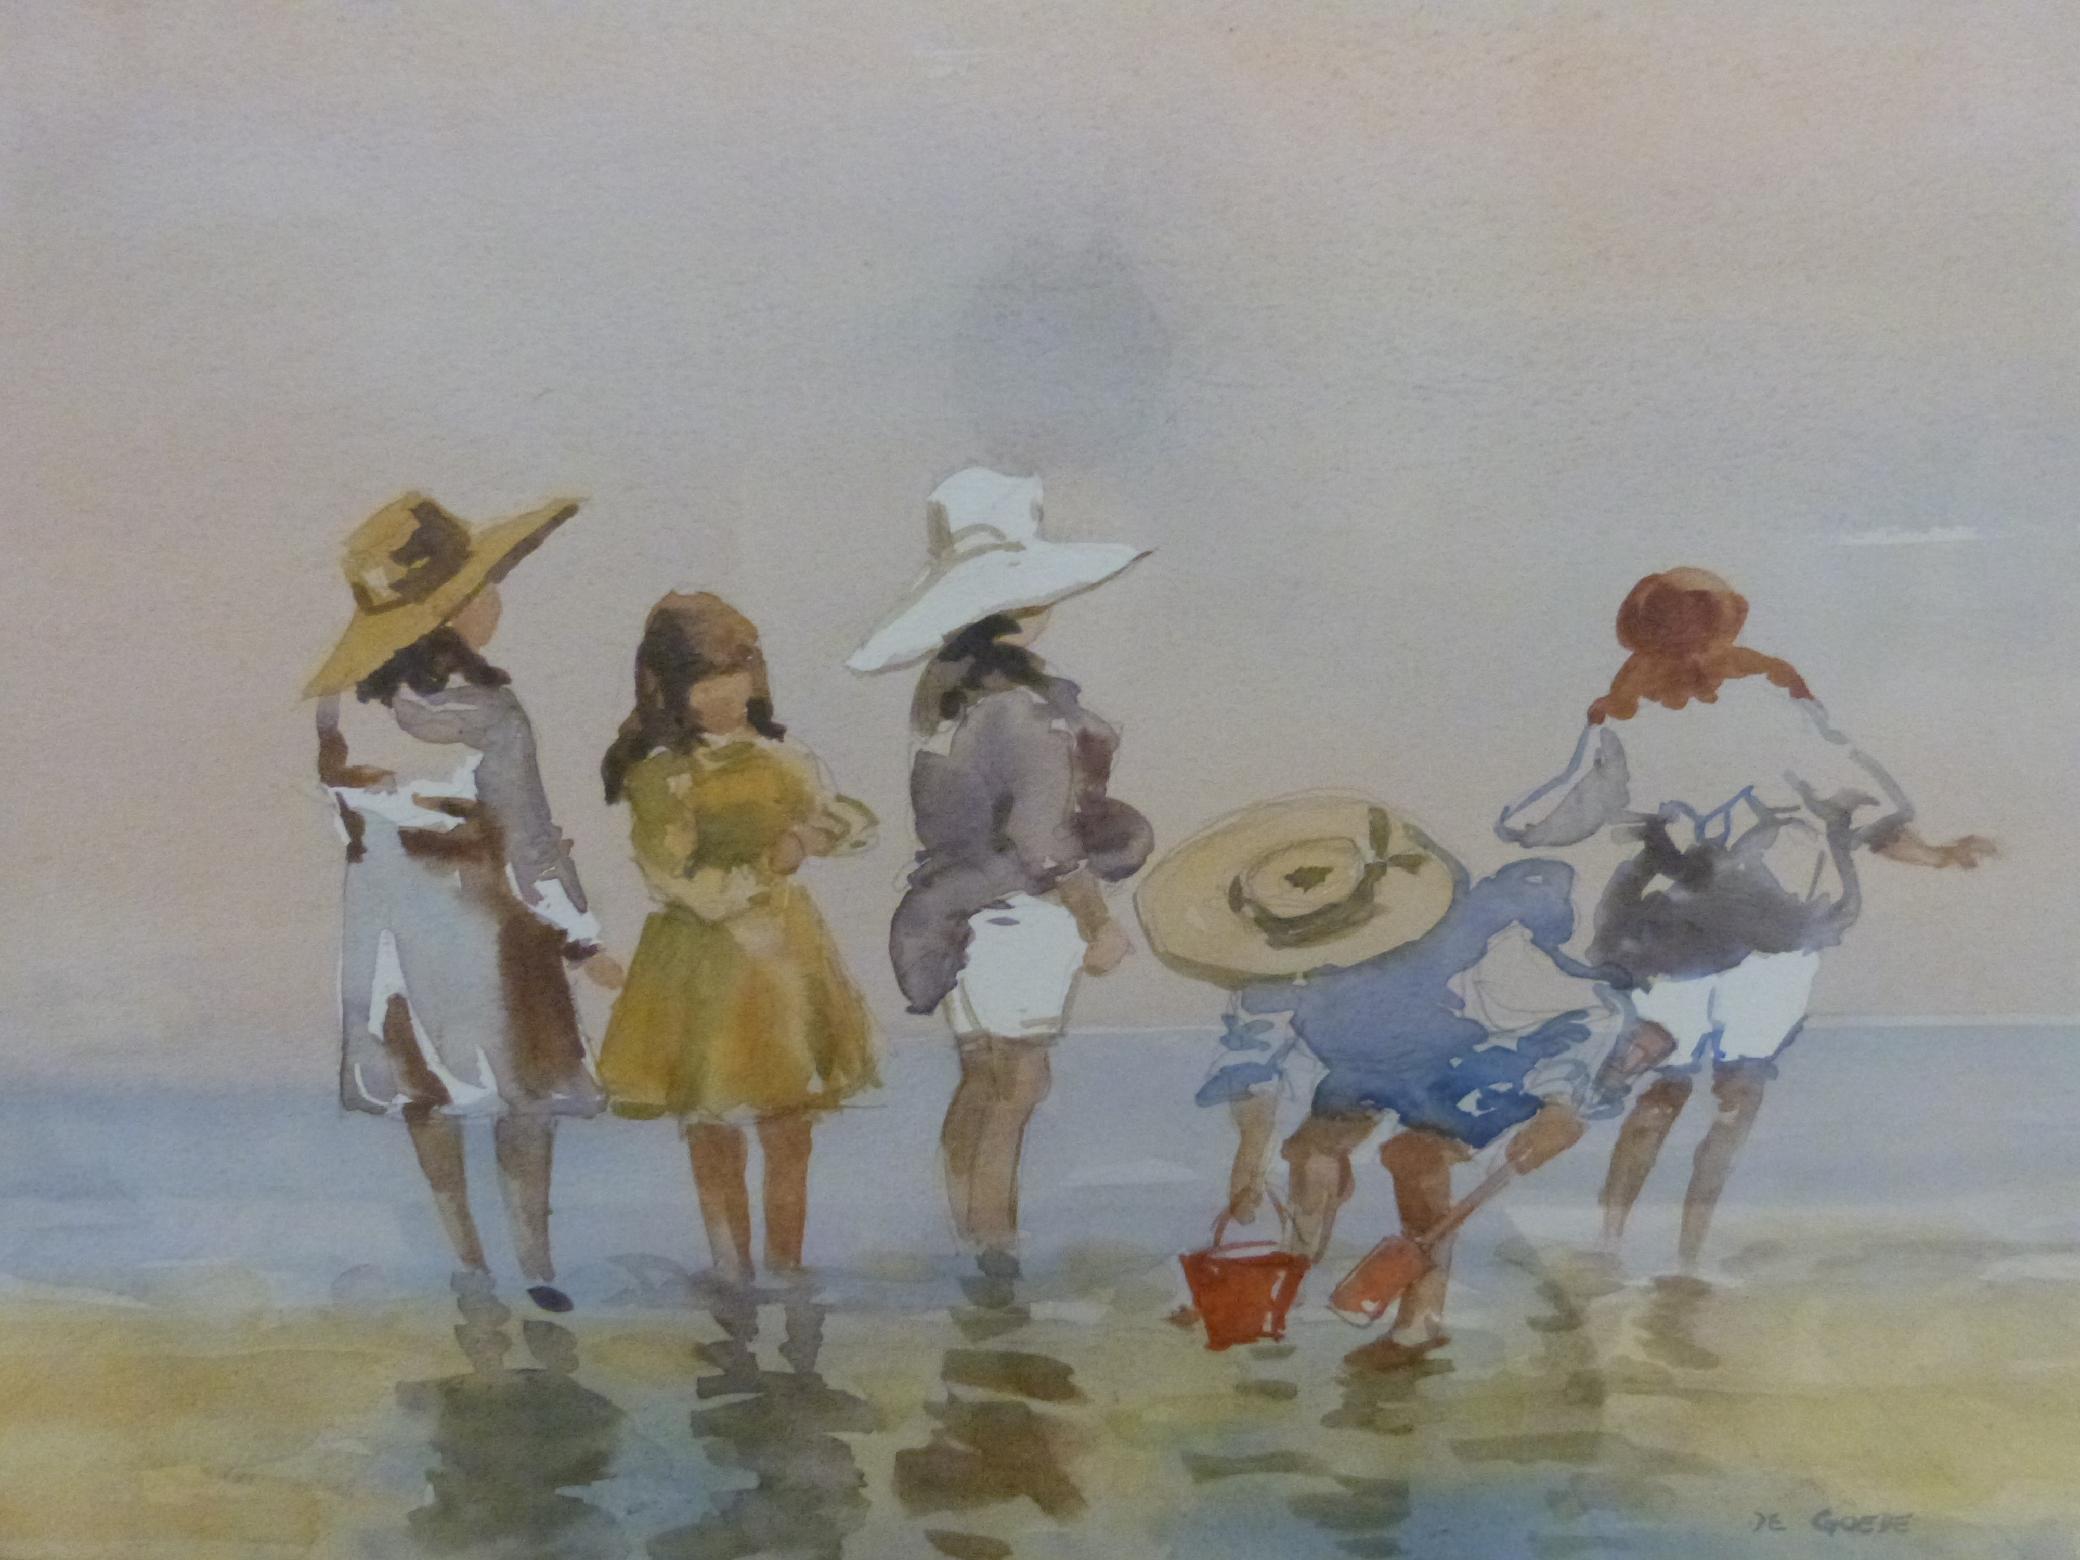 Stephen Gayford Original Paintings For Sale